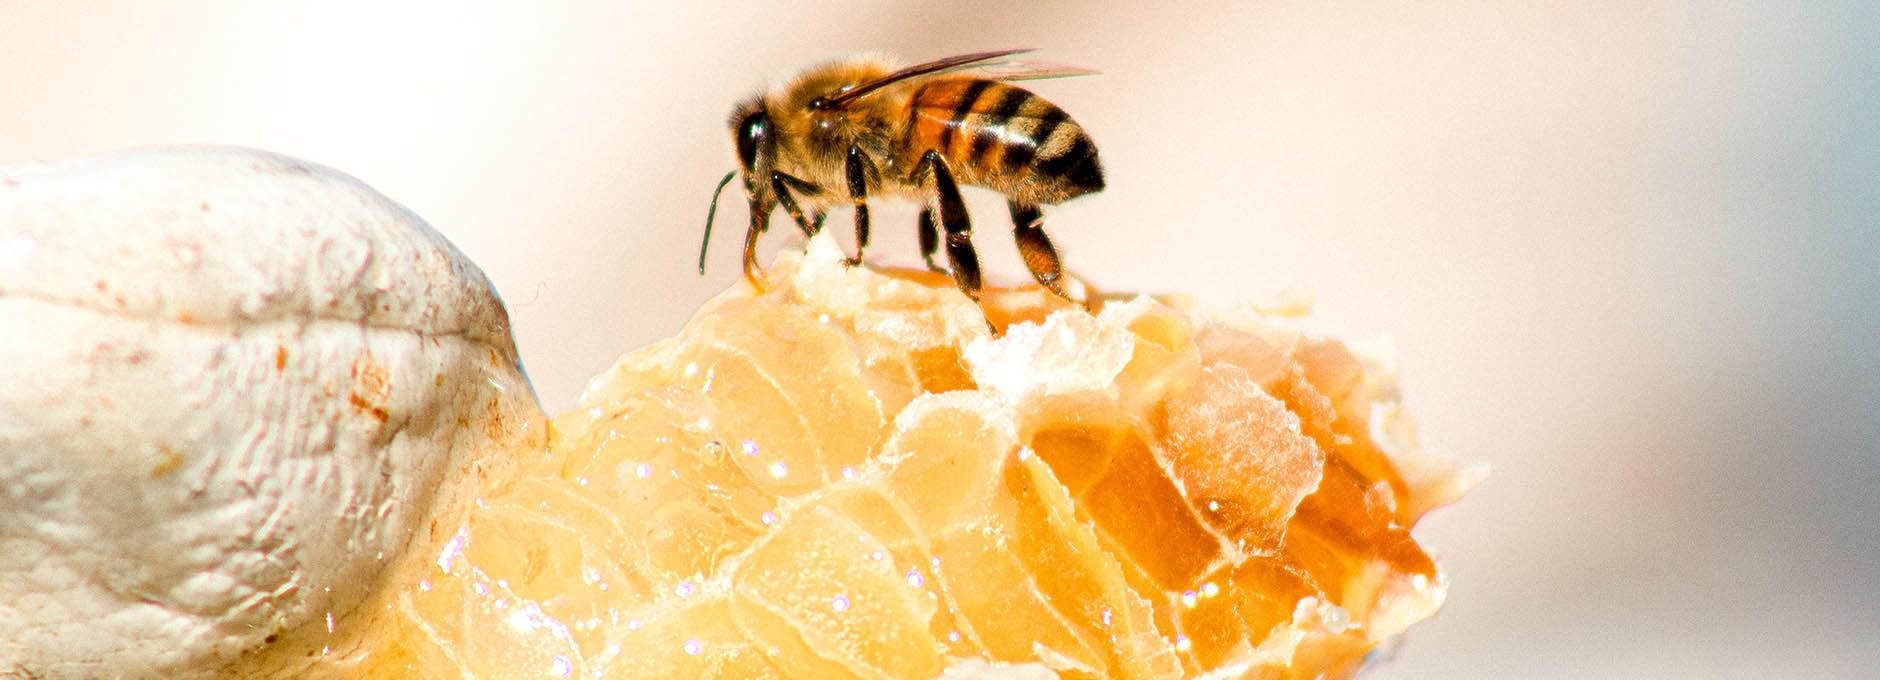 Bee on comb of honey